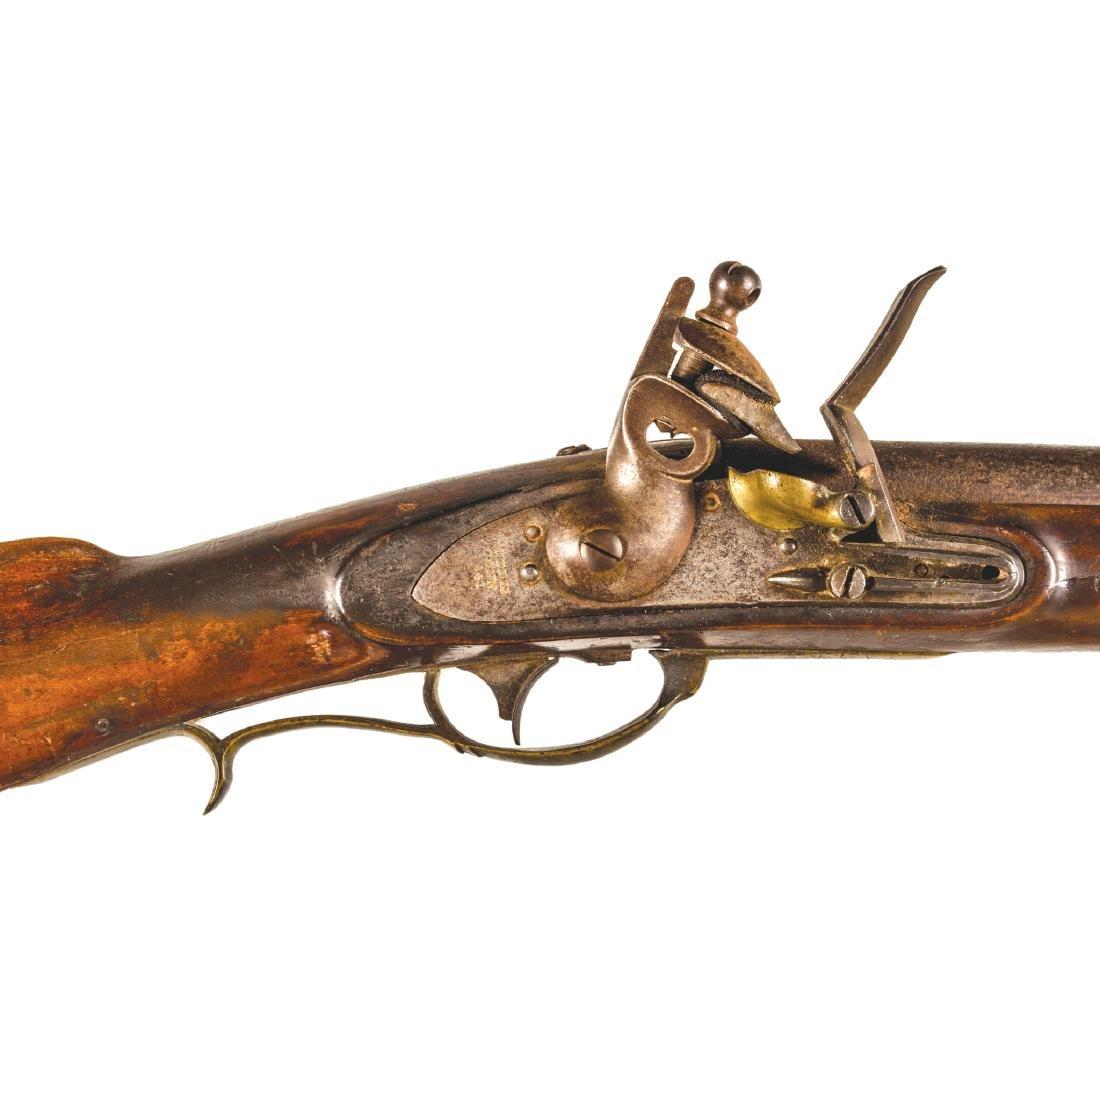 US Model 1817 Flintlock Rifle, Nathan Starr + Son - 3